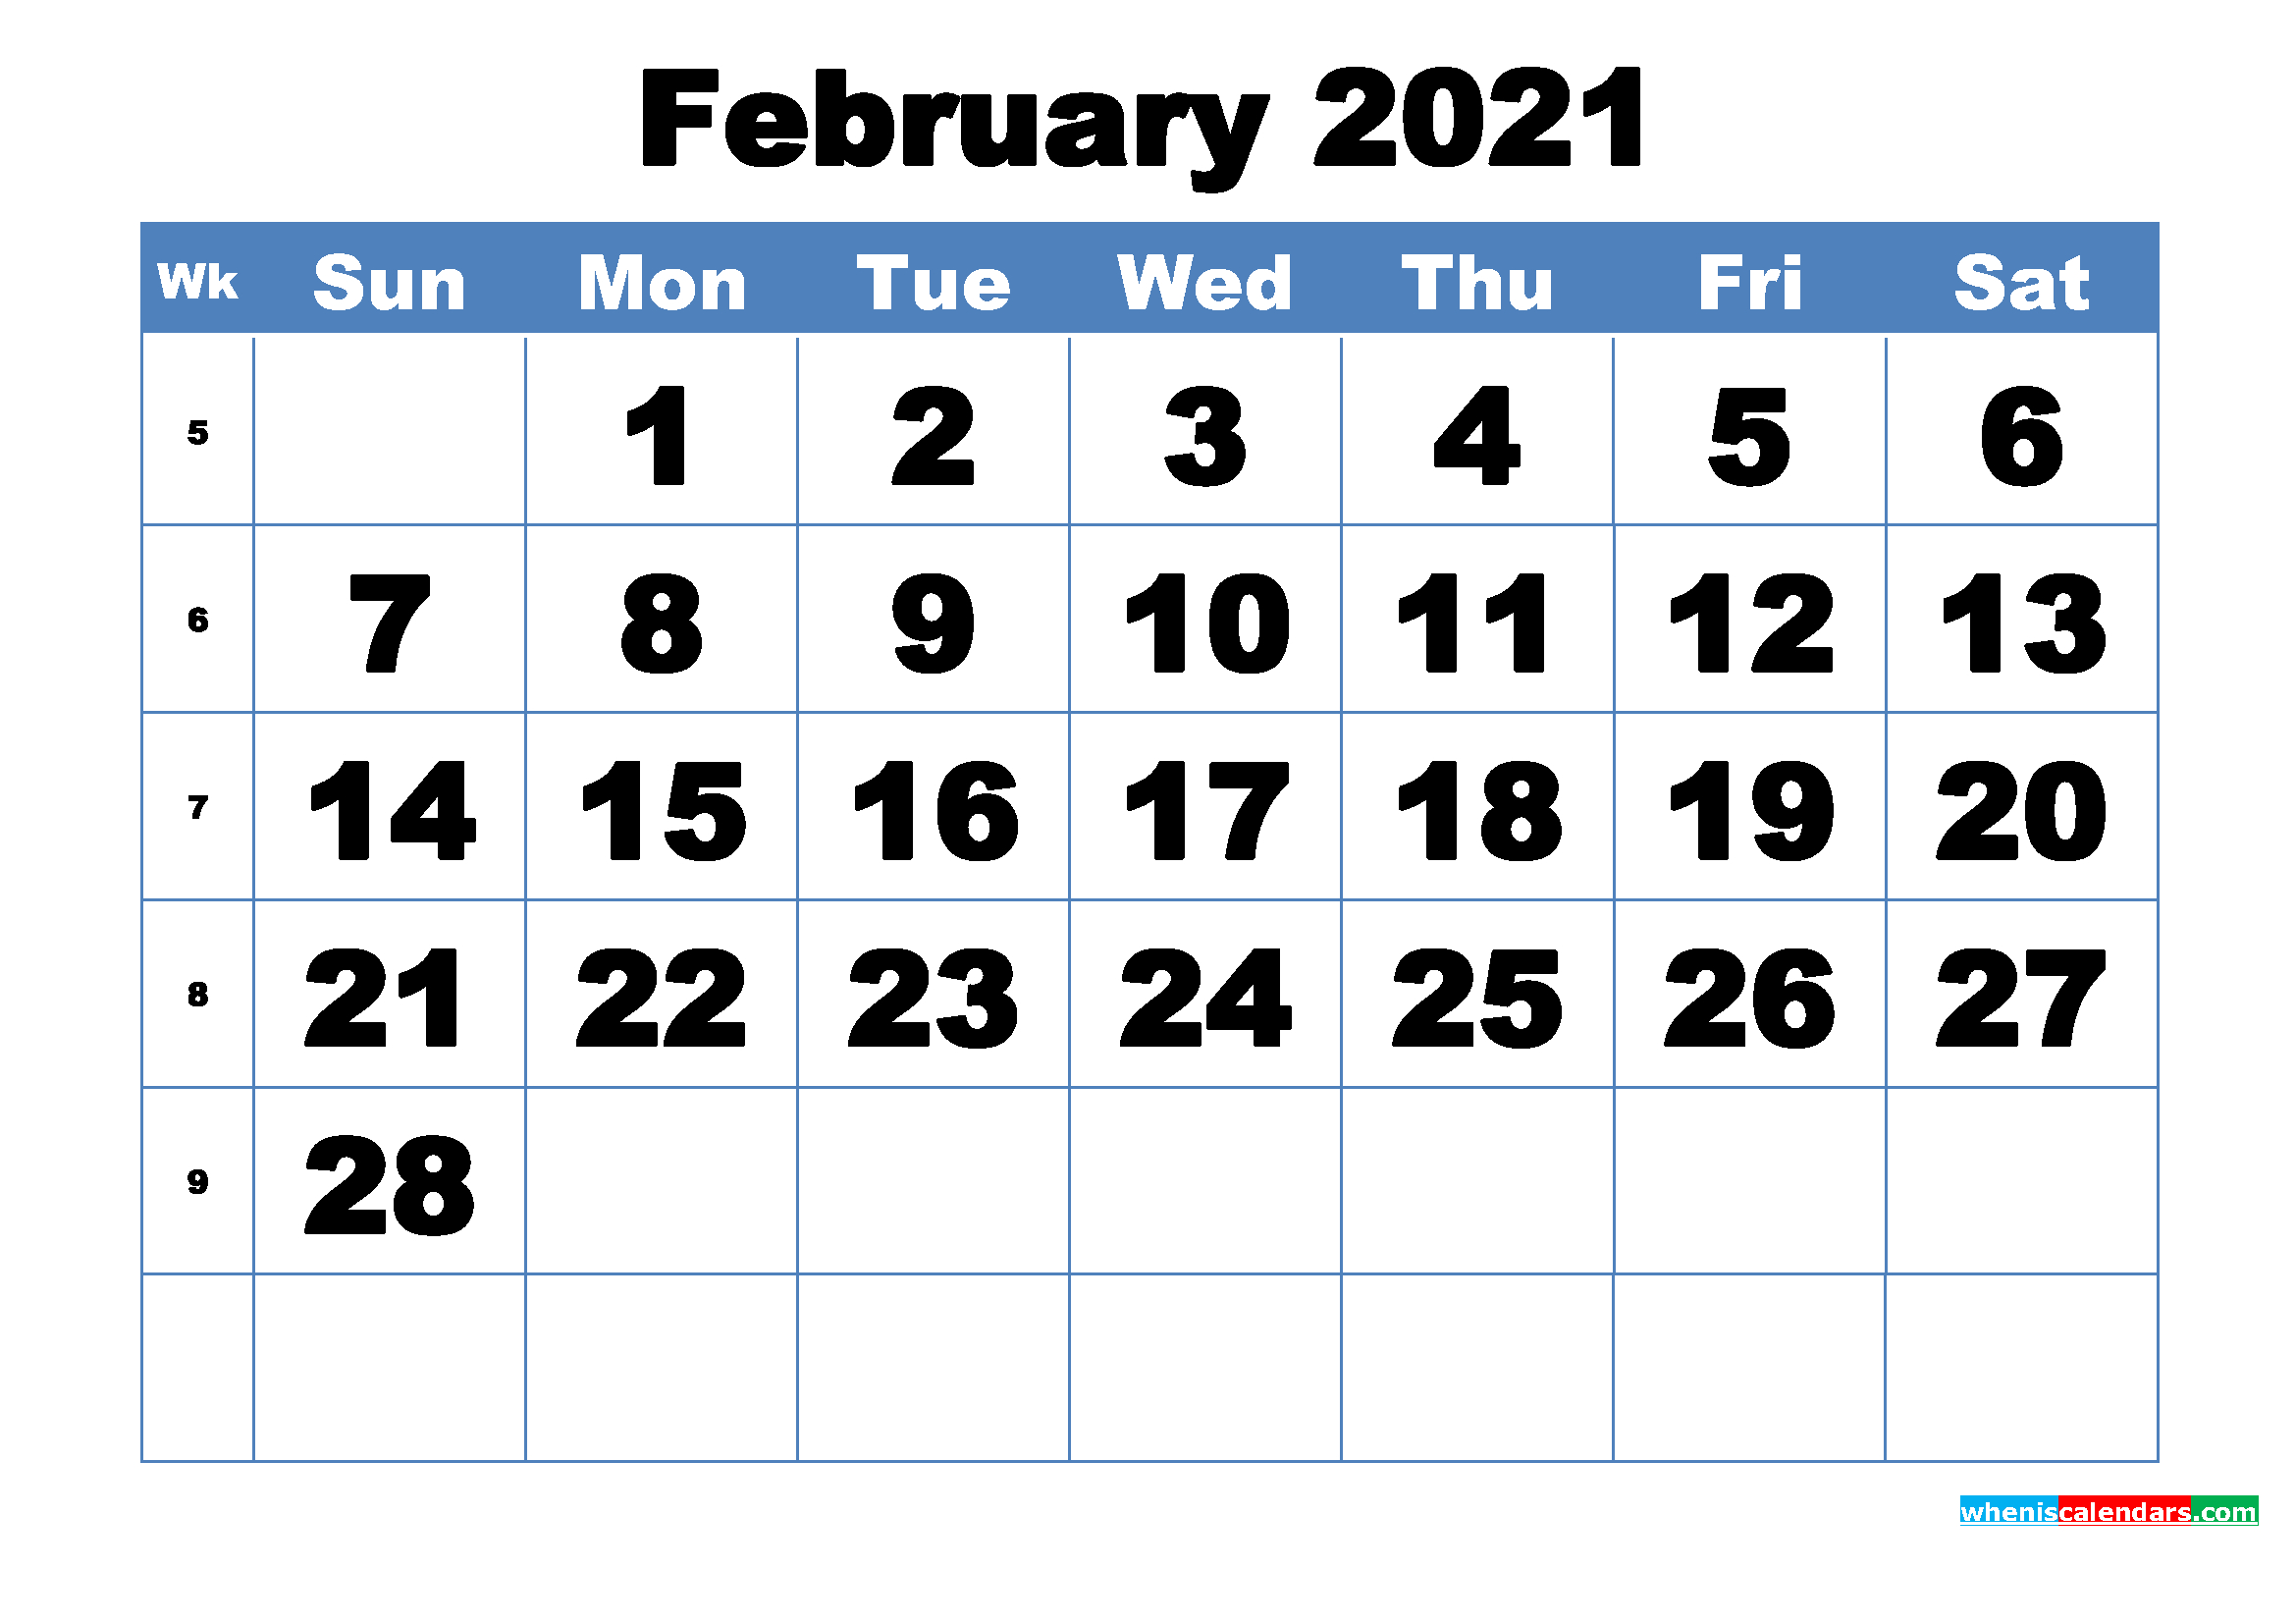 Free Printable February 2021 Calendar Template Word, Pdf  February 2021 Calendar